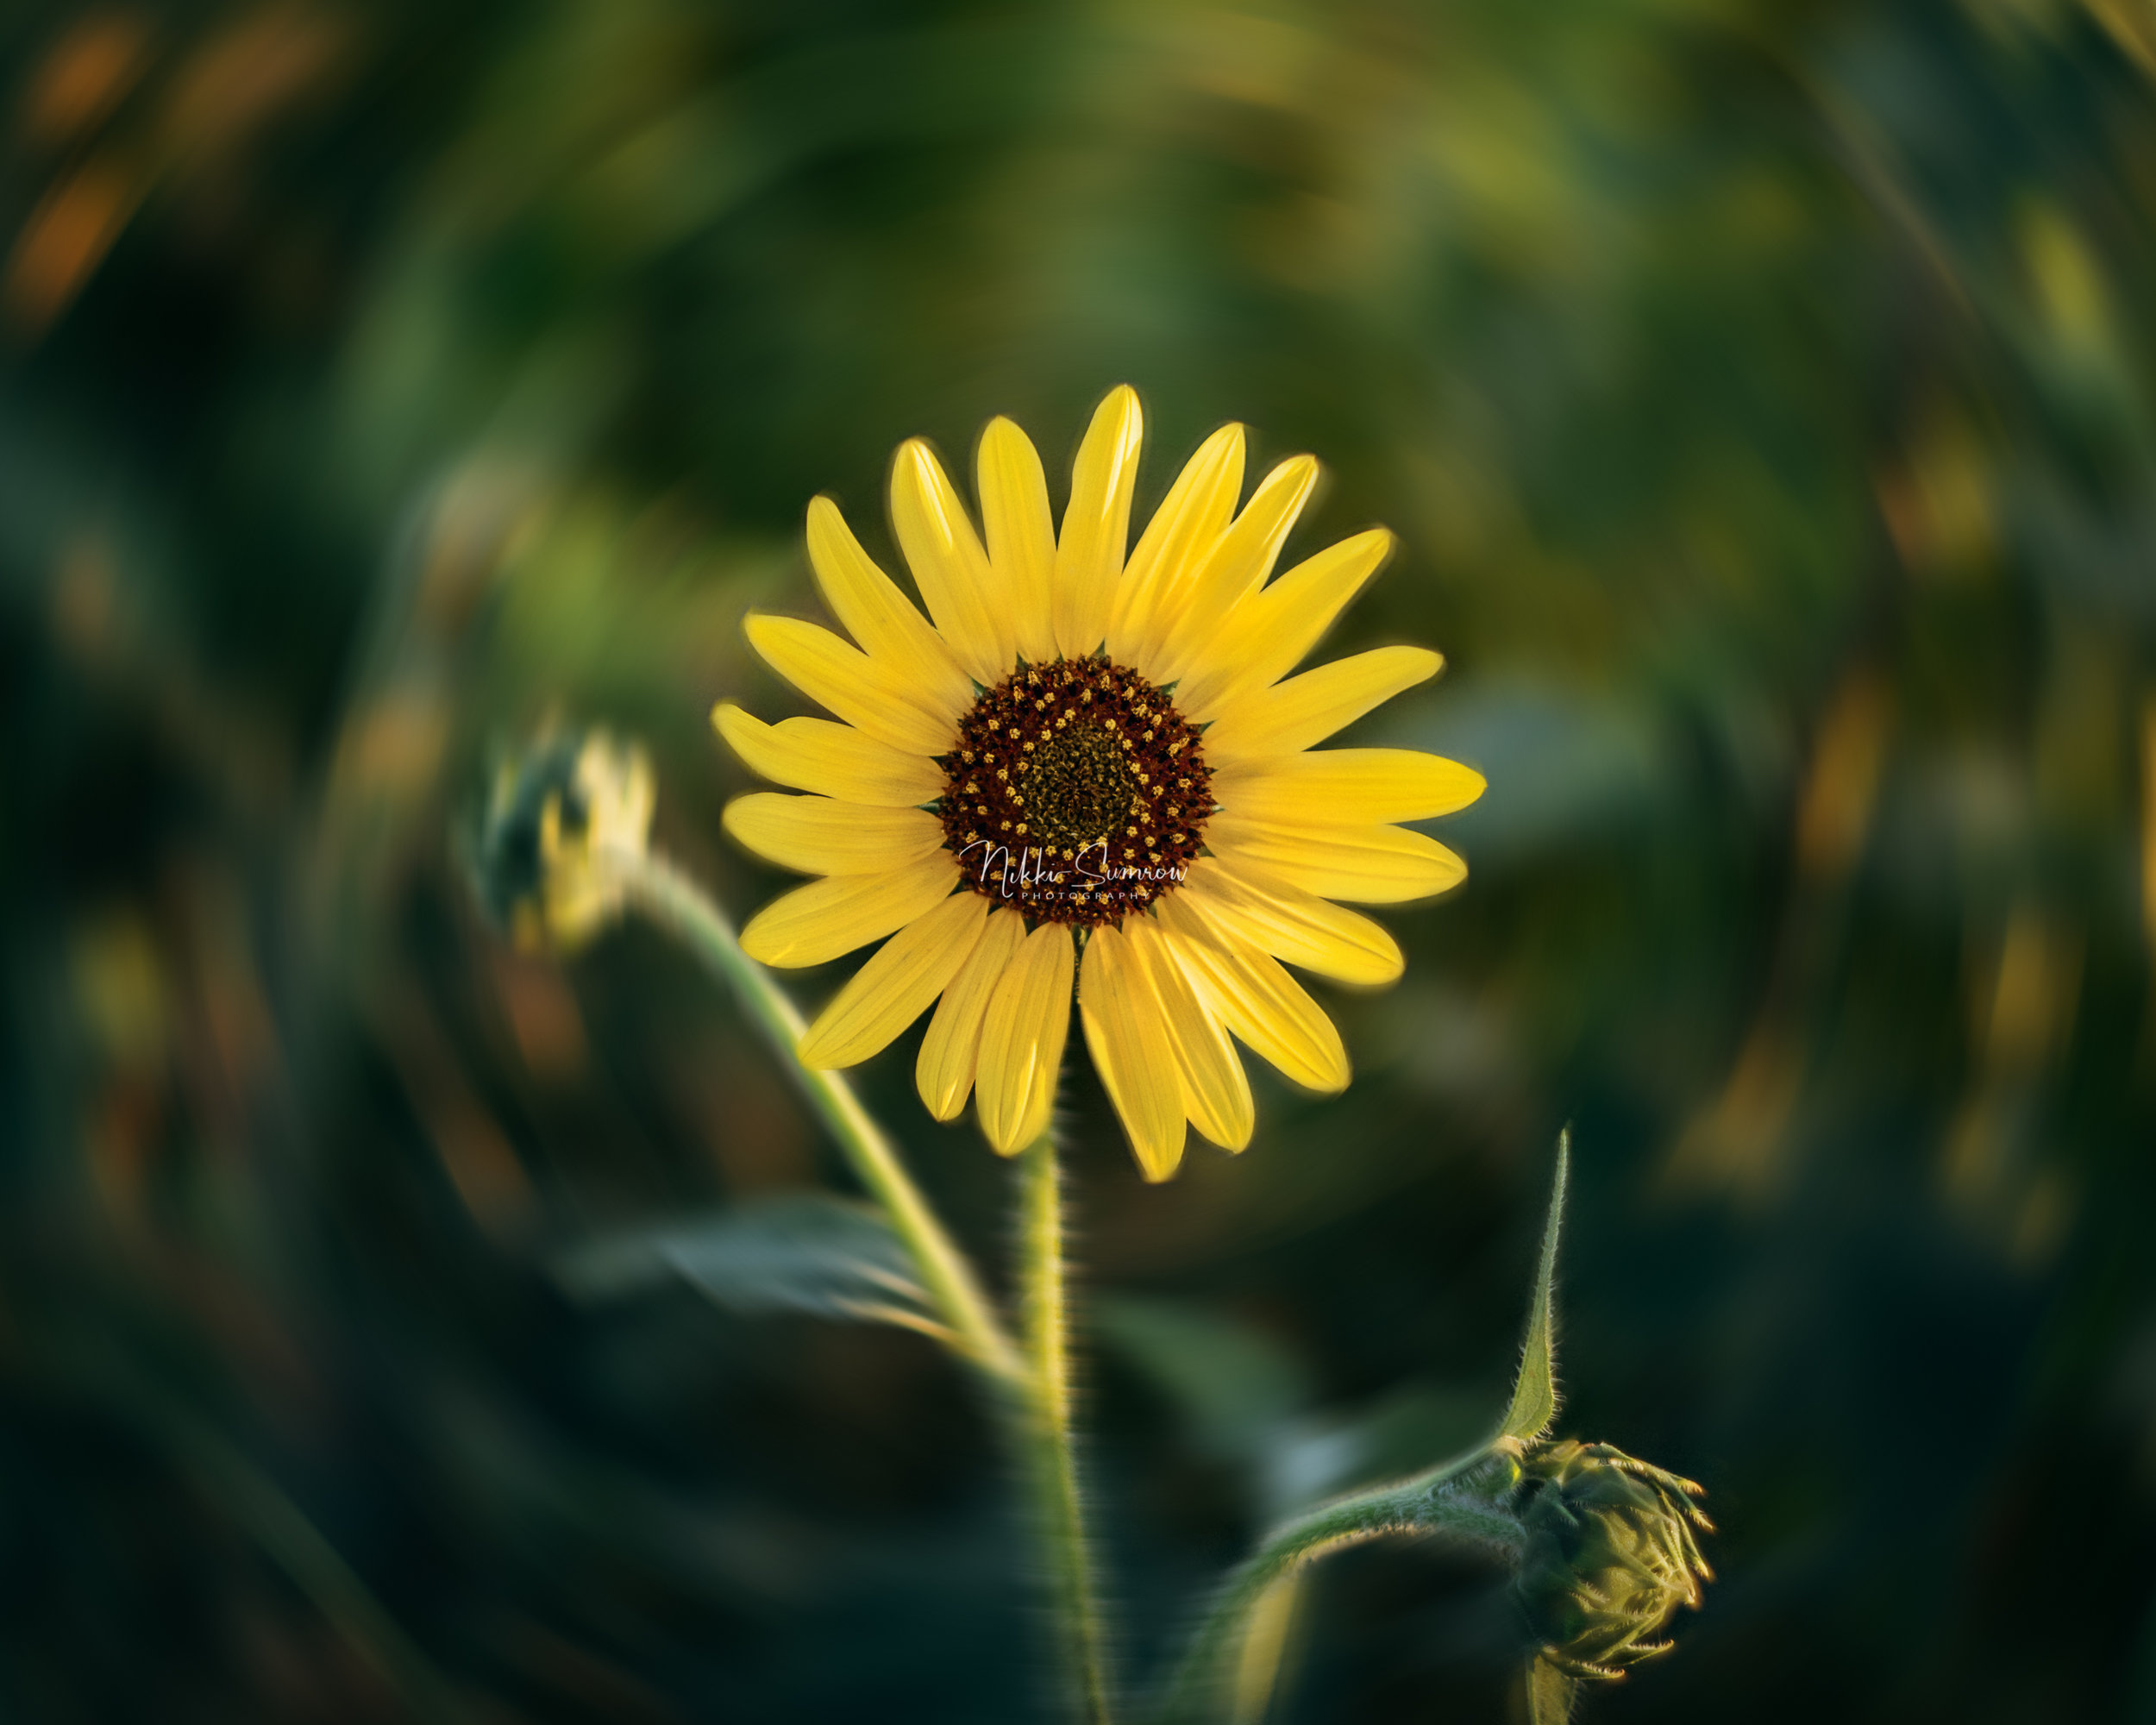 sunflowerspin_web.jpg